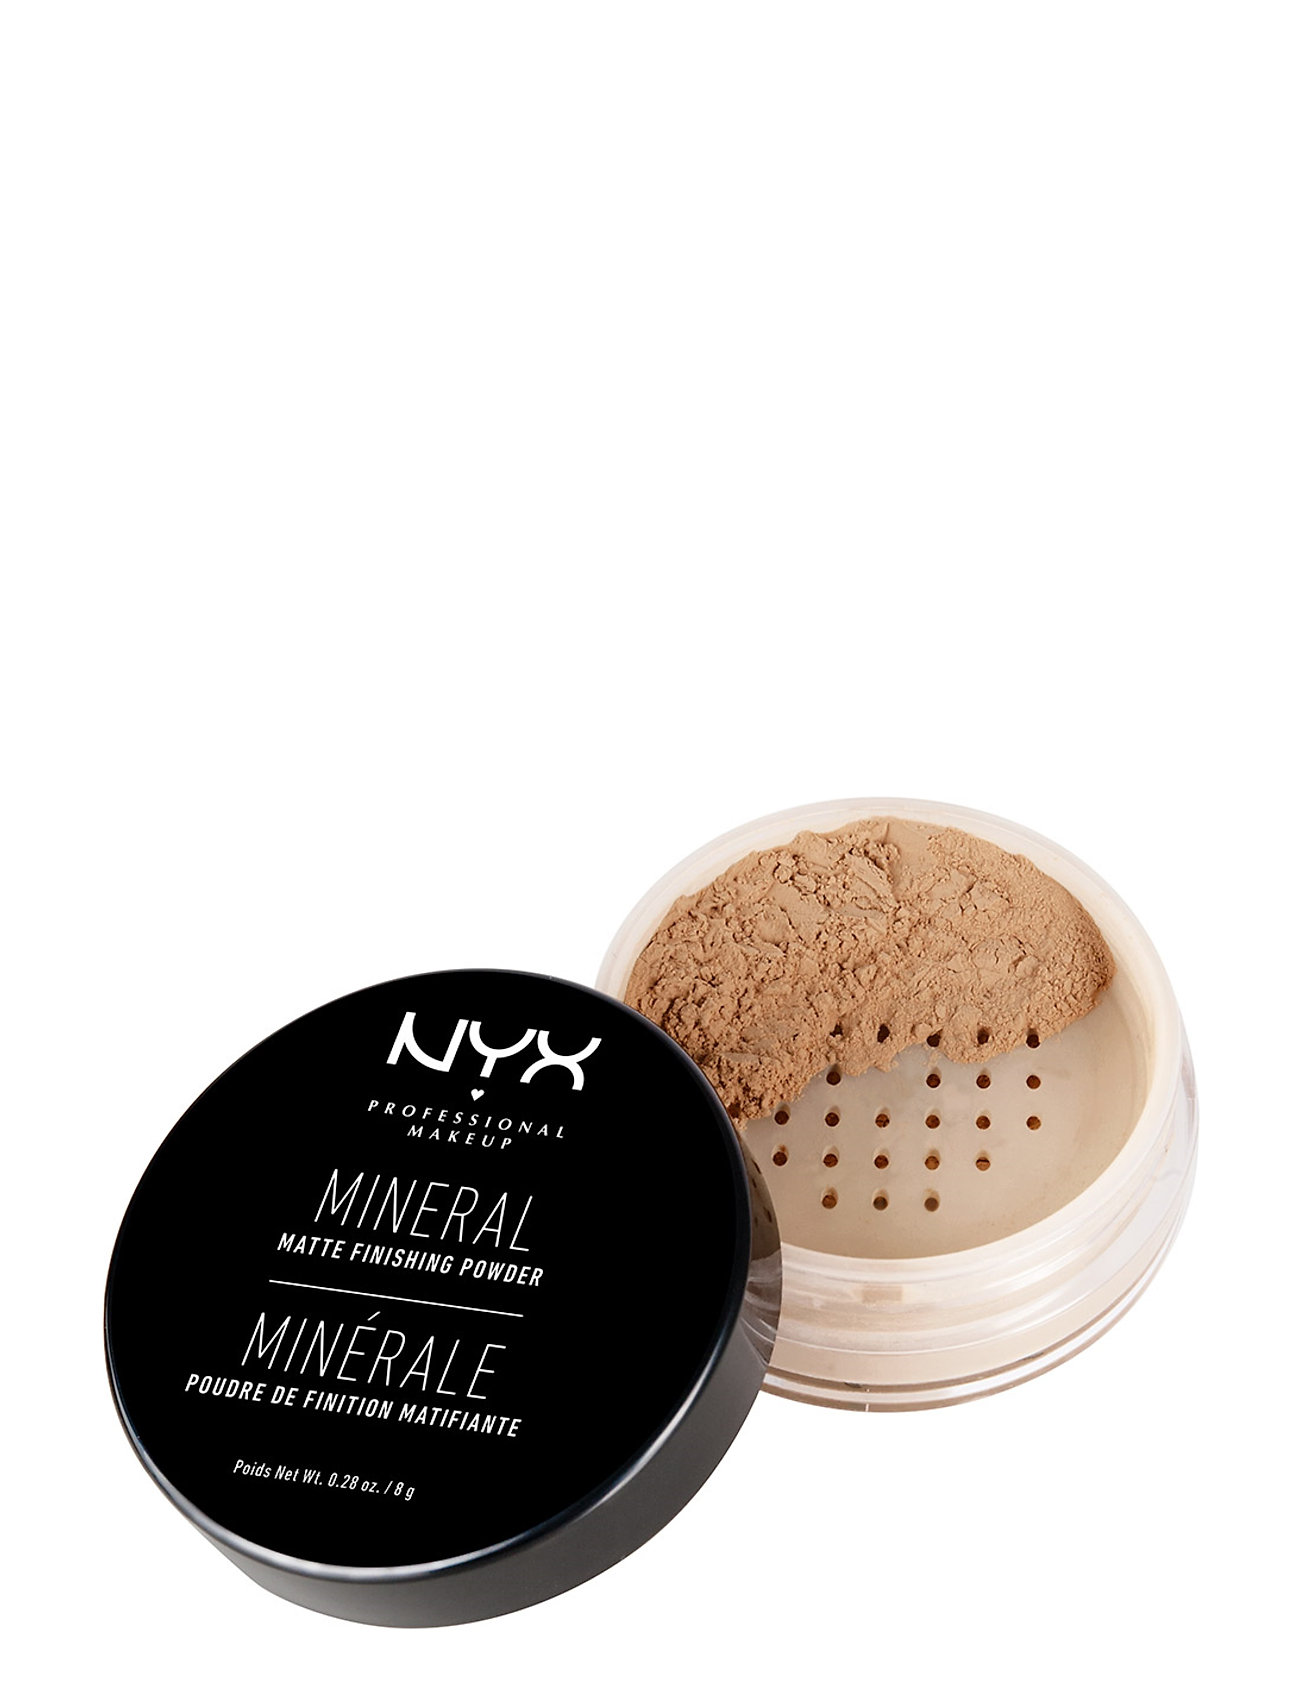 Image of Mineral Finishing Powder Pudder Makeup NYX PROFESSIONAL MAKEUP (3379134941)